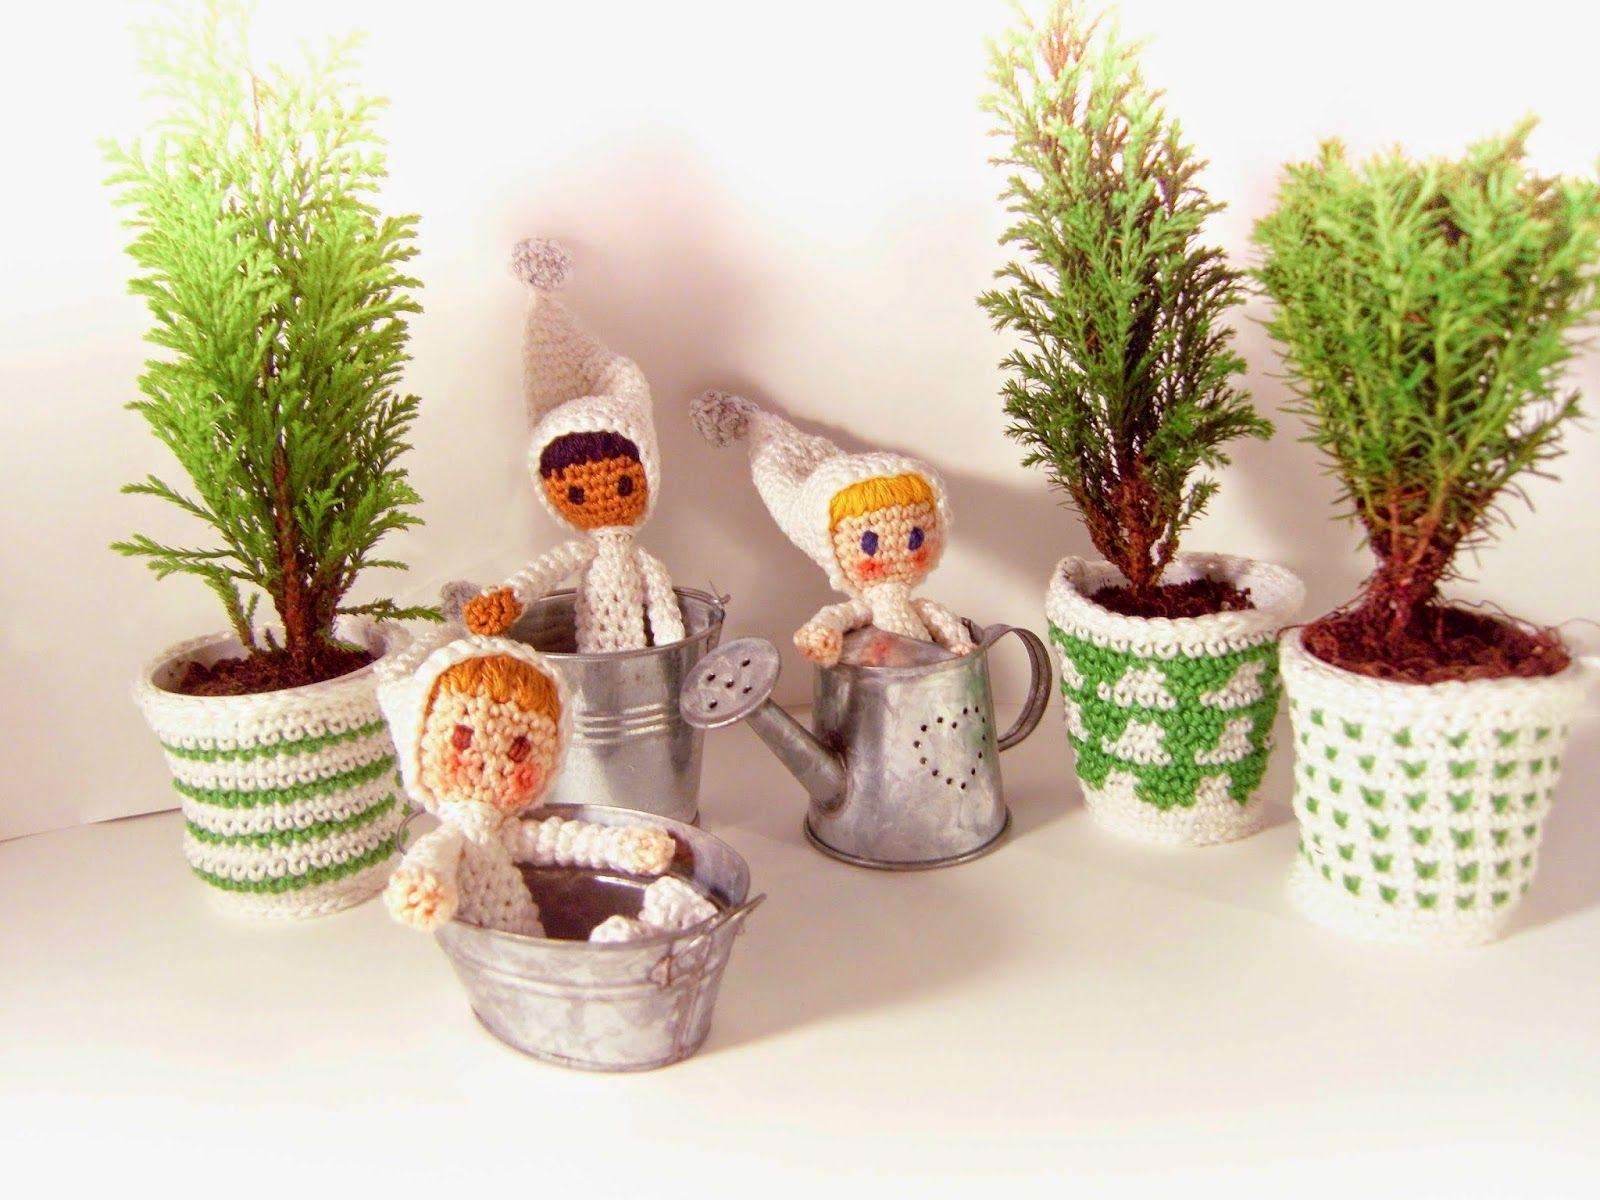 Little snow crocheted design accessories